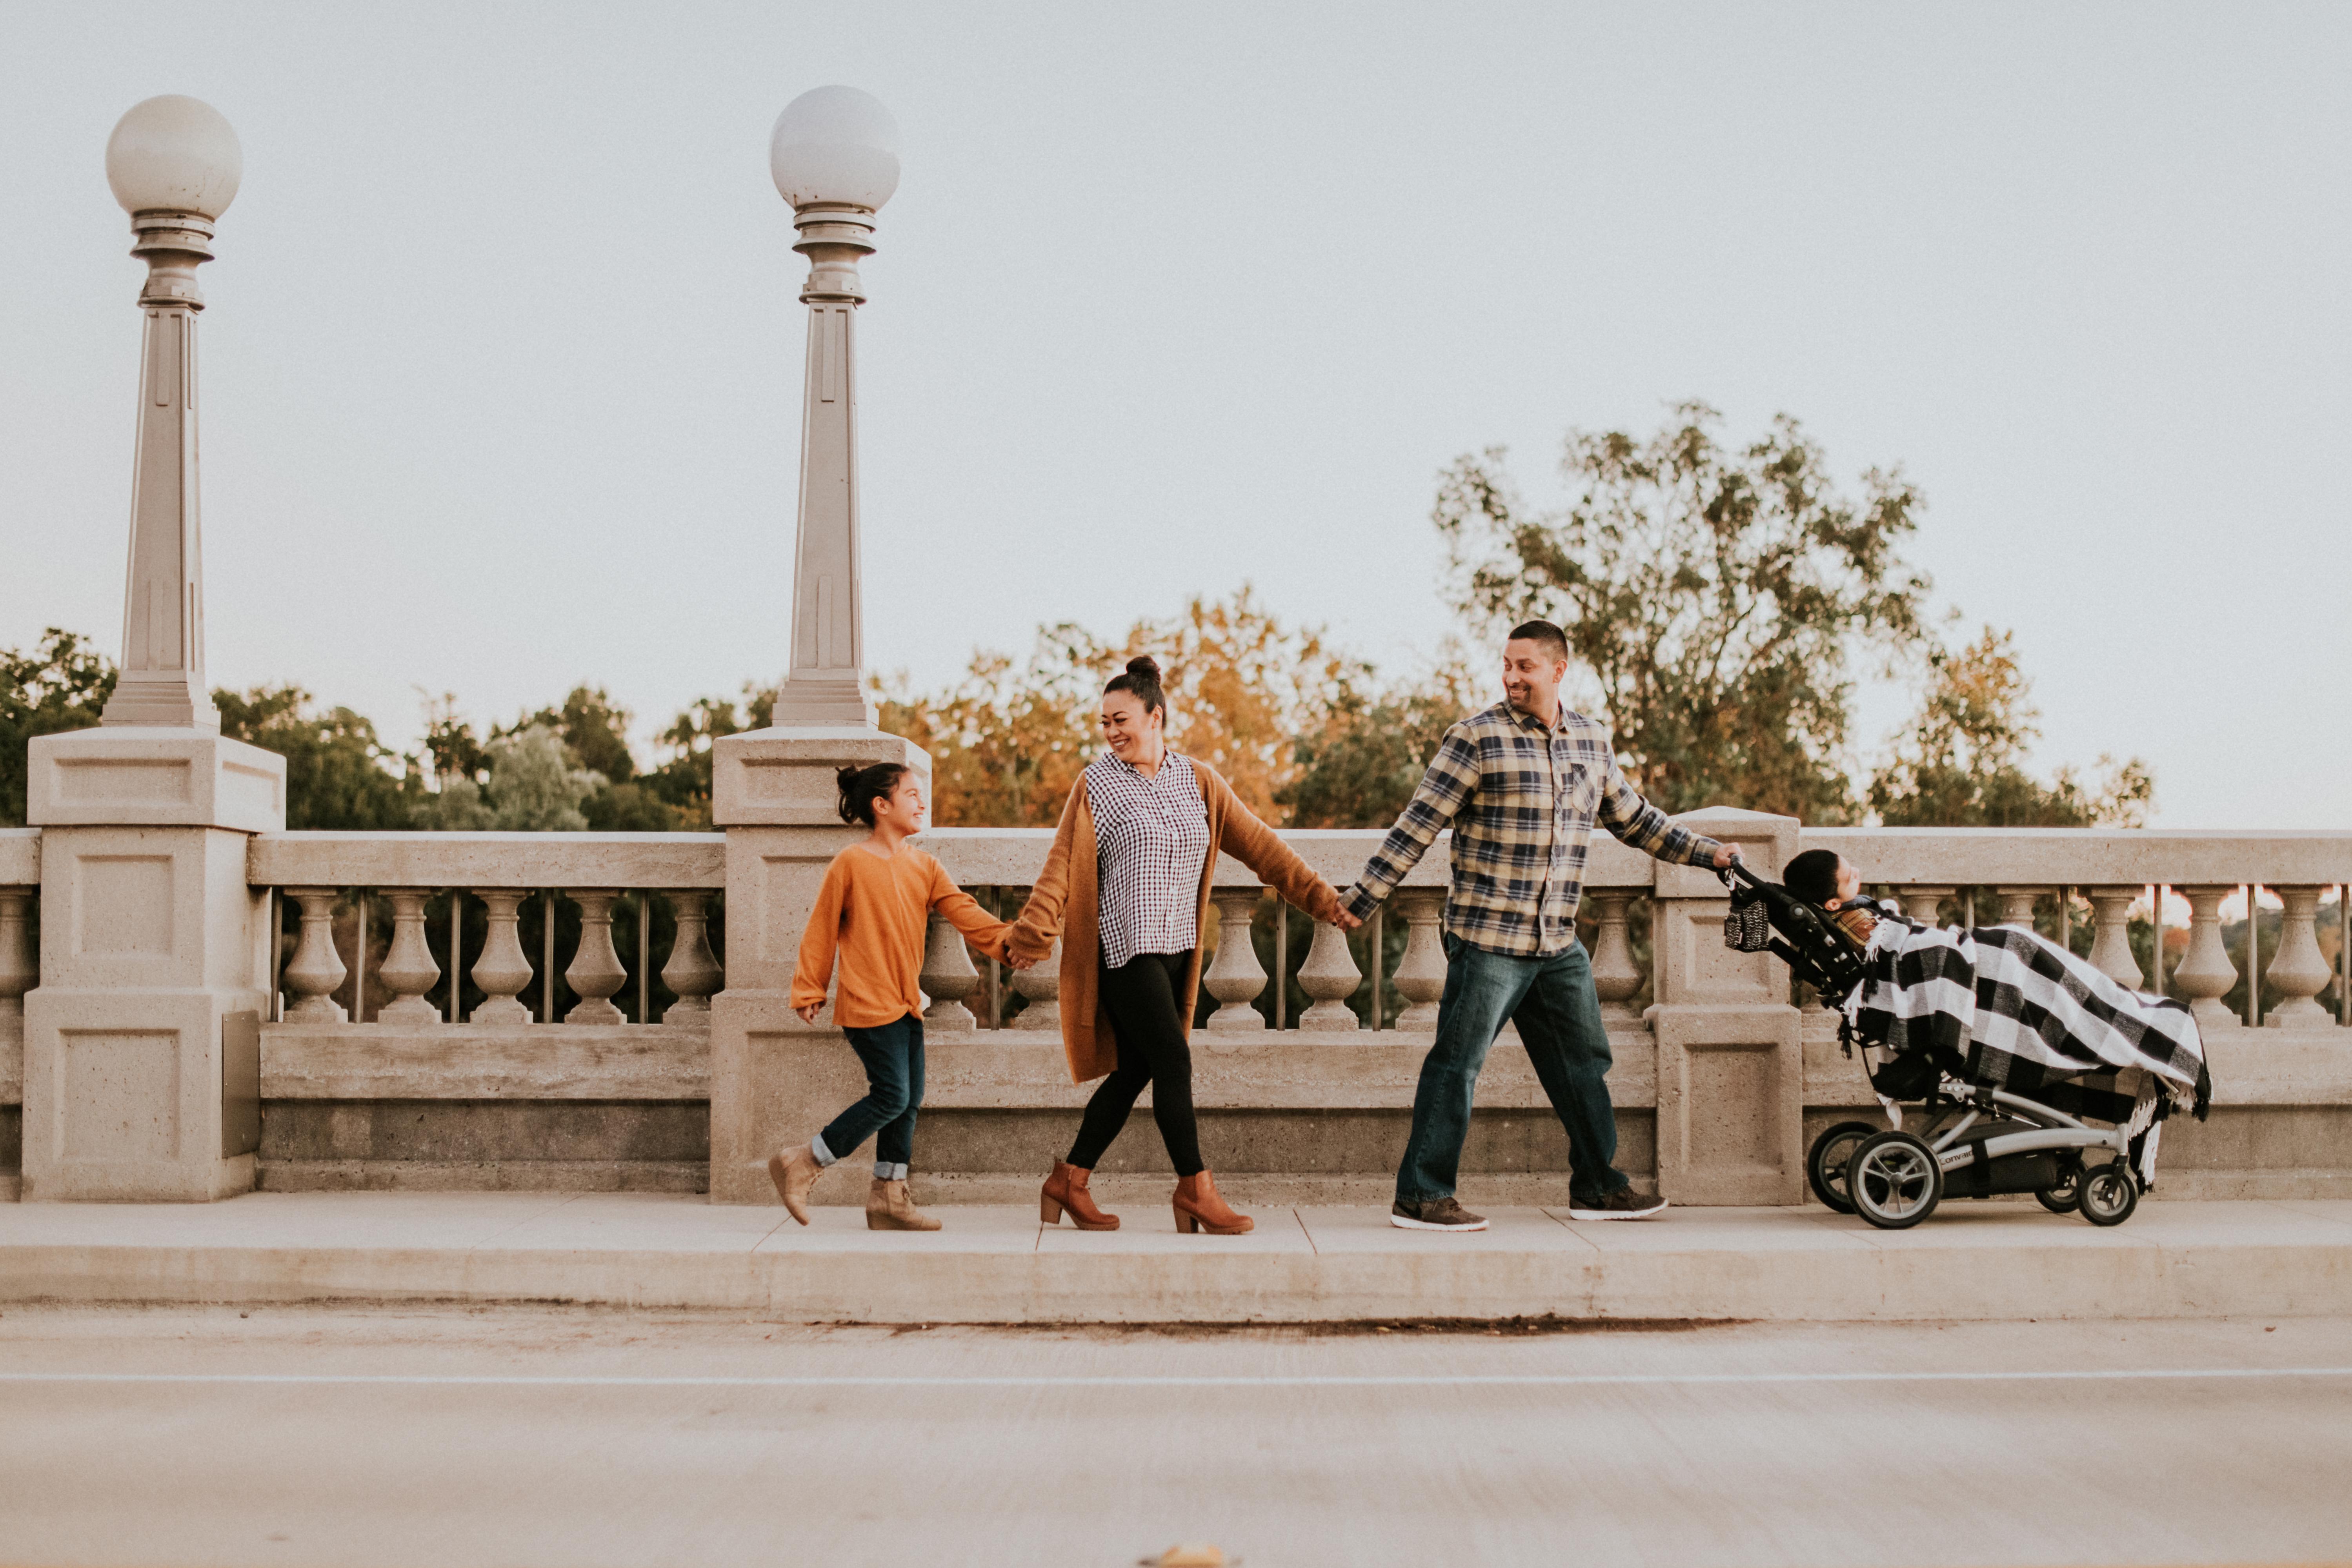 family holding hands on bridge fall photos family photography pasadena california